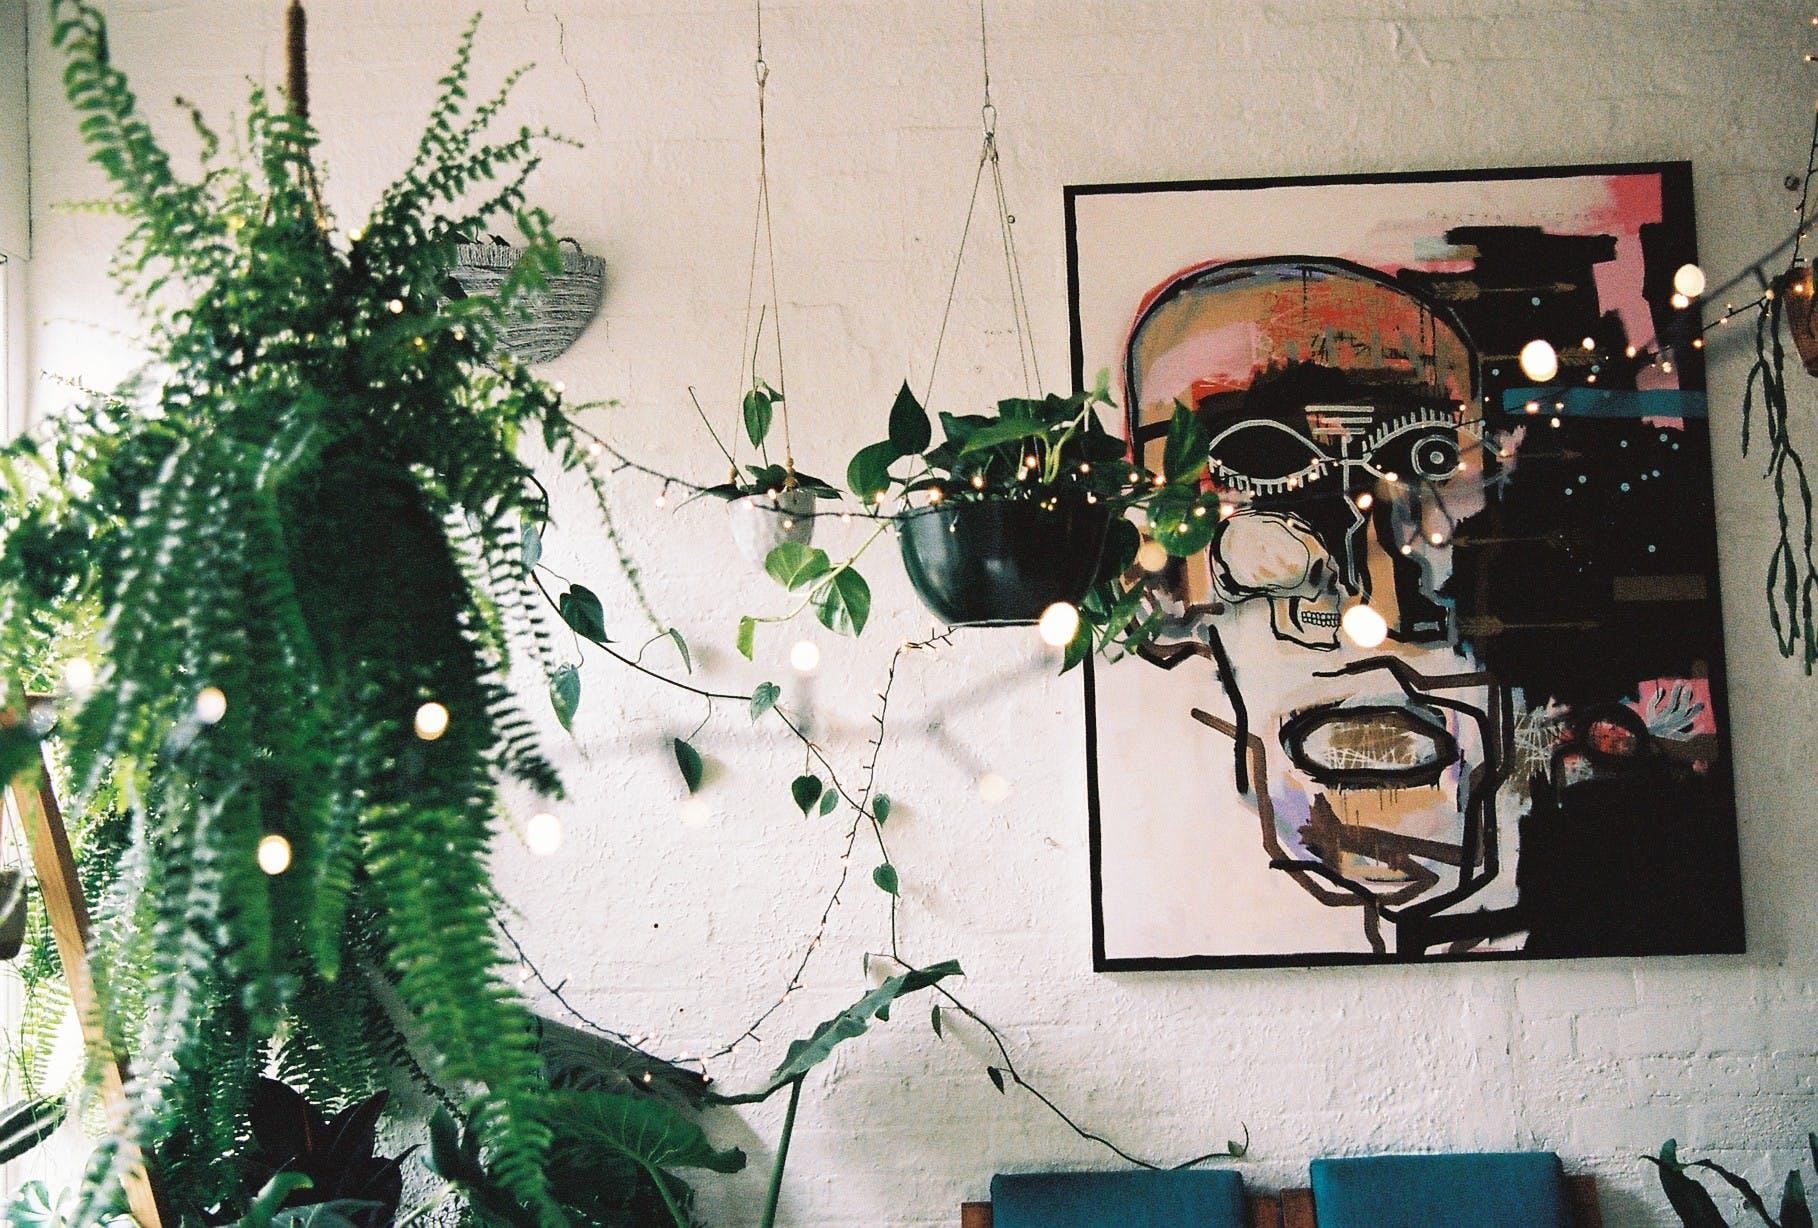 Collingwood Plant Studio, multi-use area at Jenna Holmes, image 1